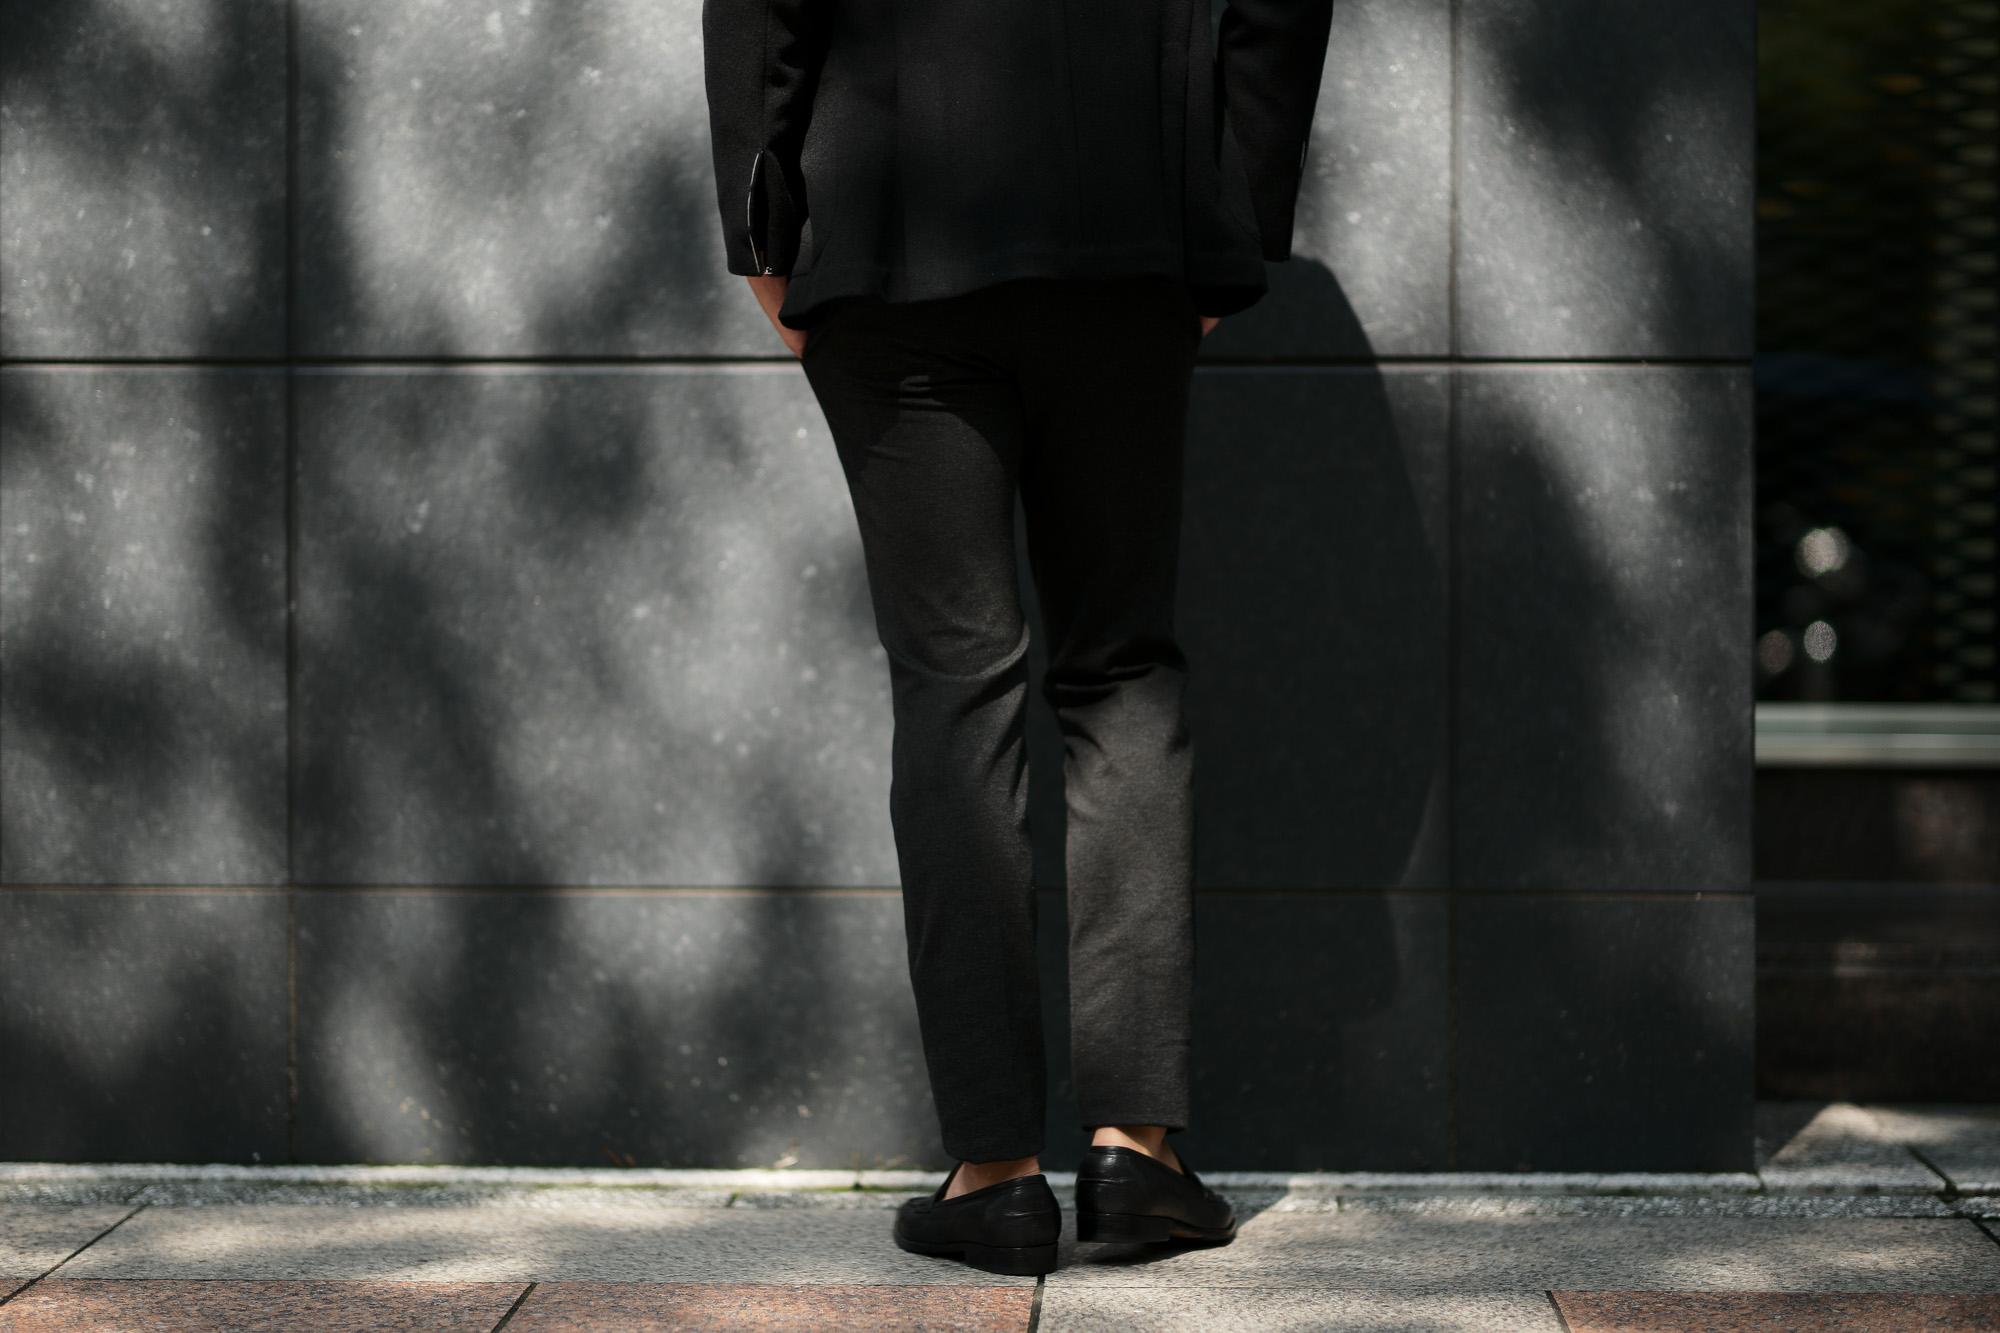 PT01 (ピーティーゼロウーノ) TRAVELLER (トラベラー) SUPER SLIM FIT (スーパースリムフィット) Stretch Techno Jersey ストレッチ テクノ ジャージ スラックス CHARCOAL GRAY (チャコールグレー・0250) 2019 秋冬新作 愛知 名古屋 altoediritto アルトエデリット